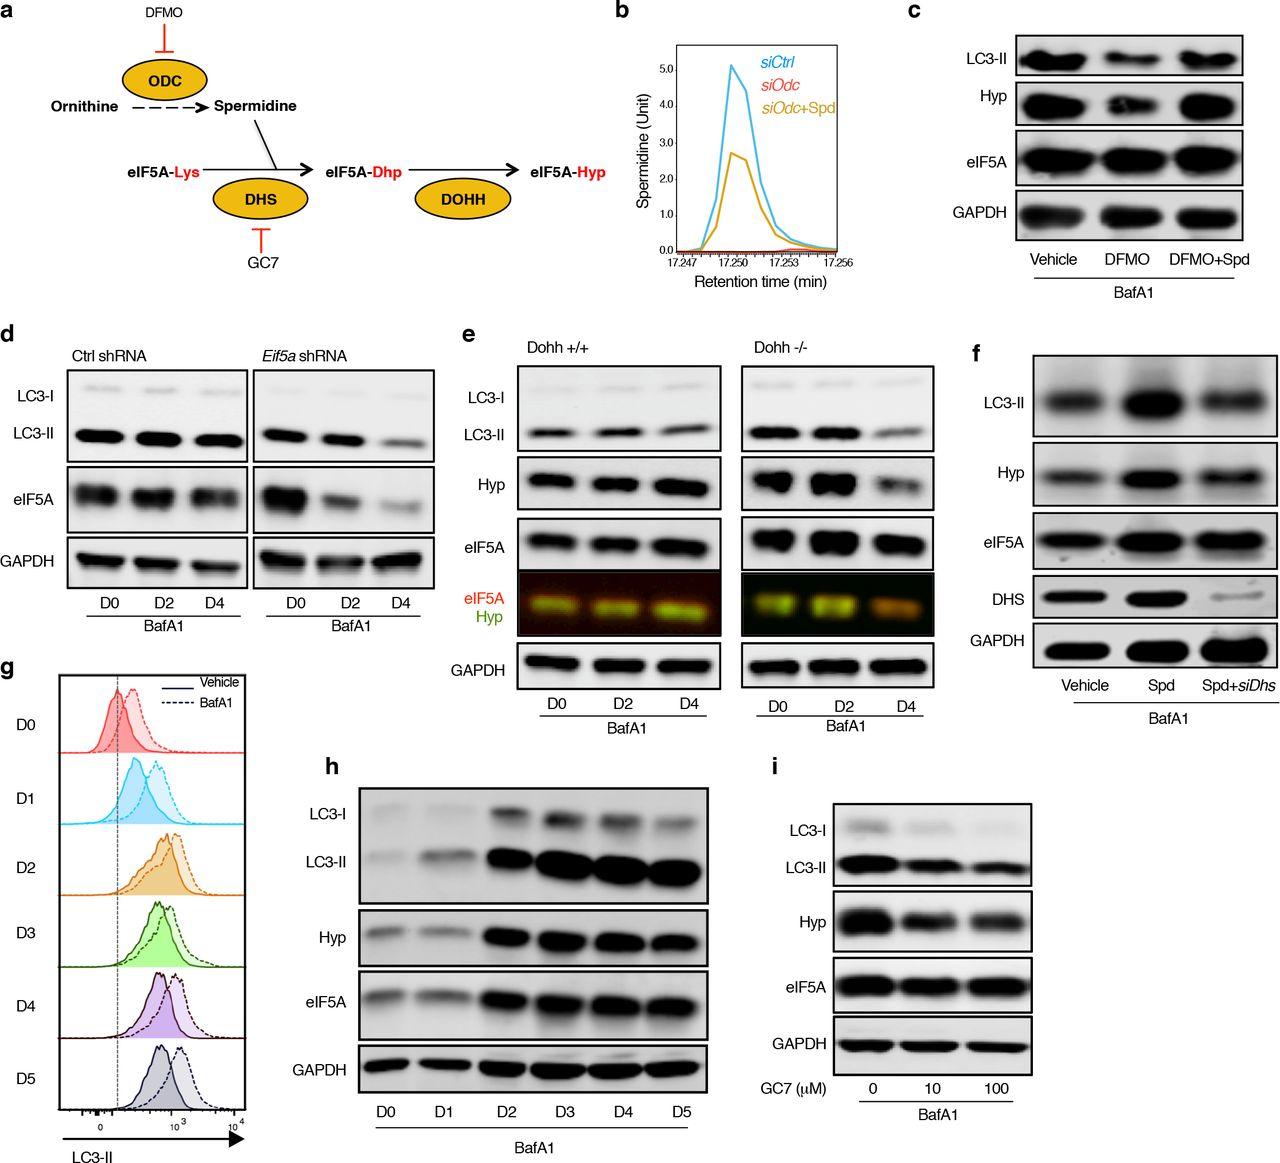 Translational control of TFEB and autophagy via eIF5A rejuvenates B